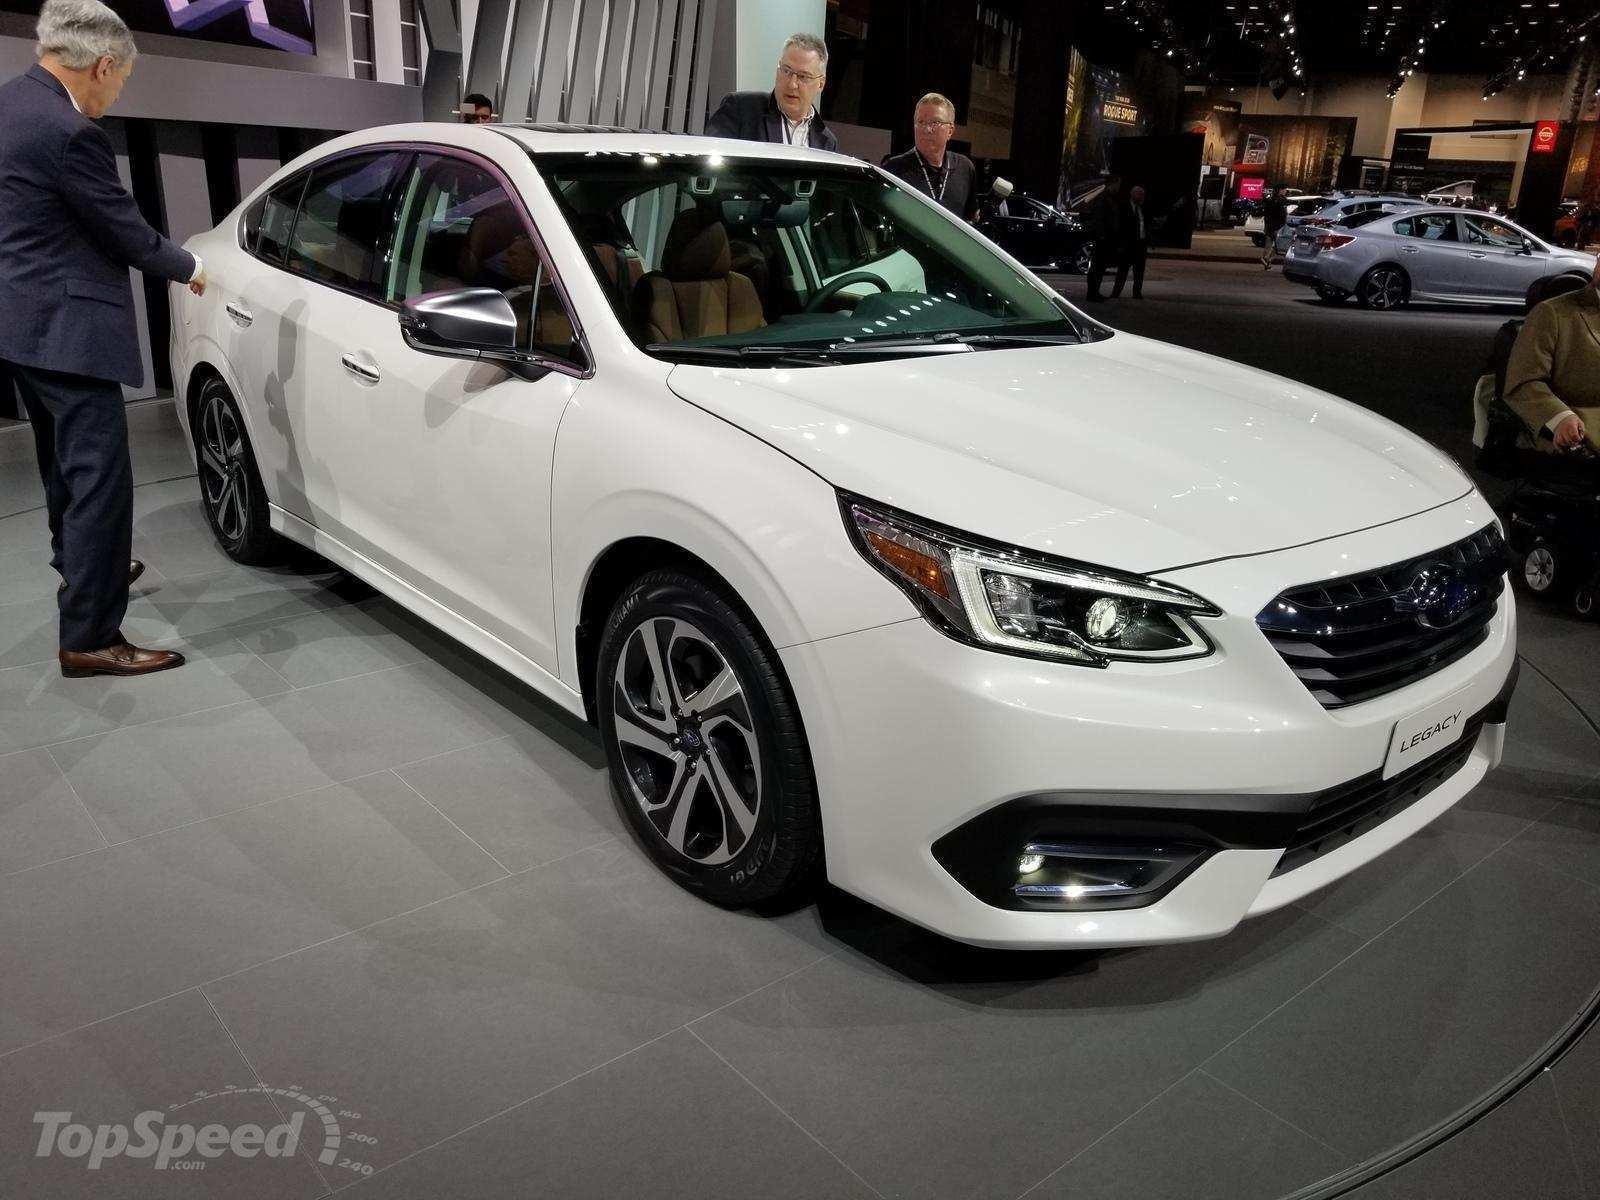 88 New 2020 Subaru Dimensions Price and Review for 2020 Subaru Dimensions